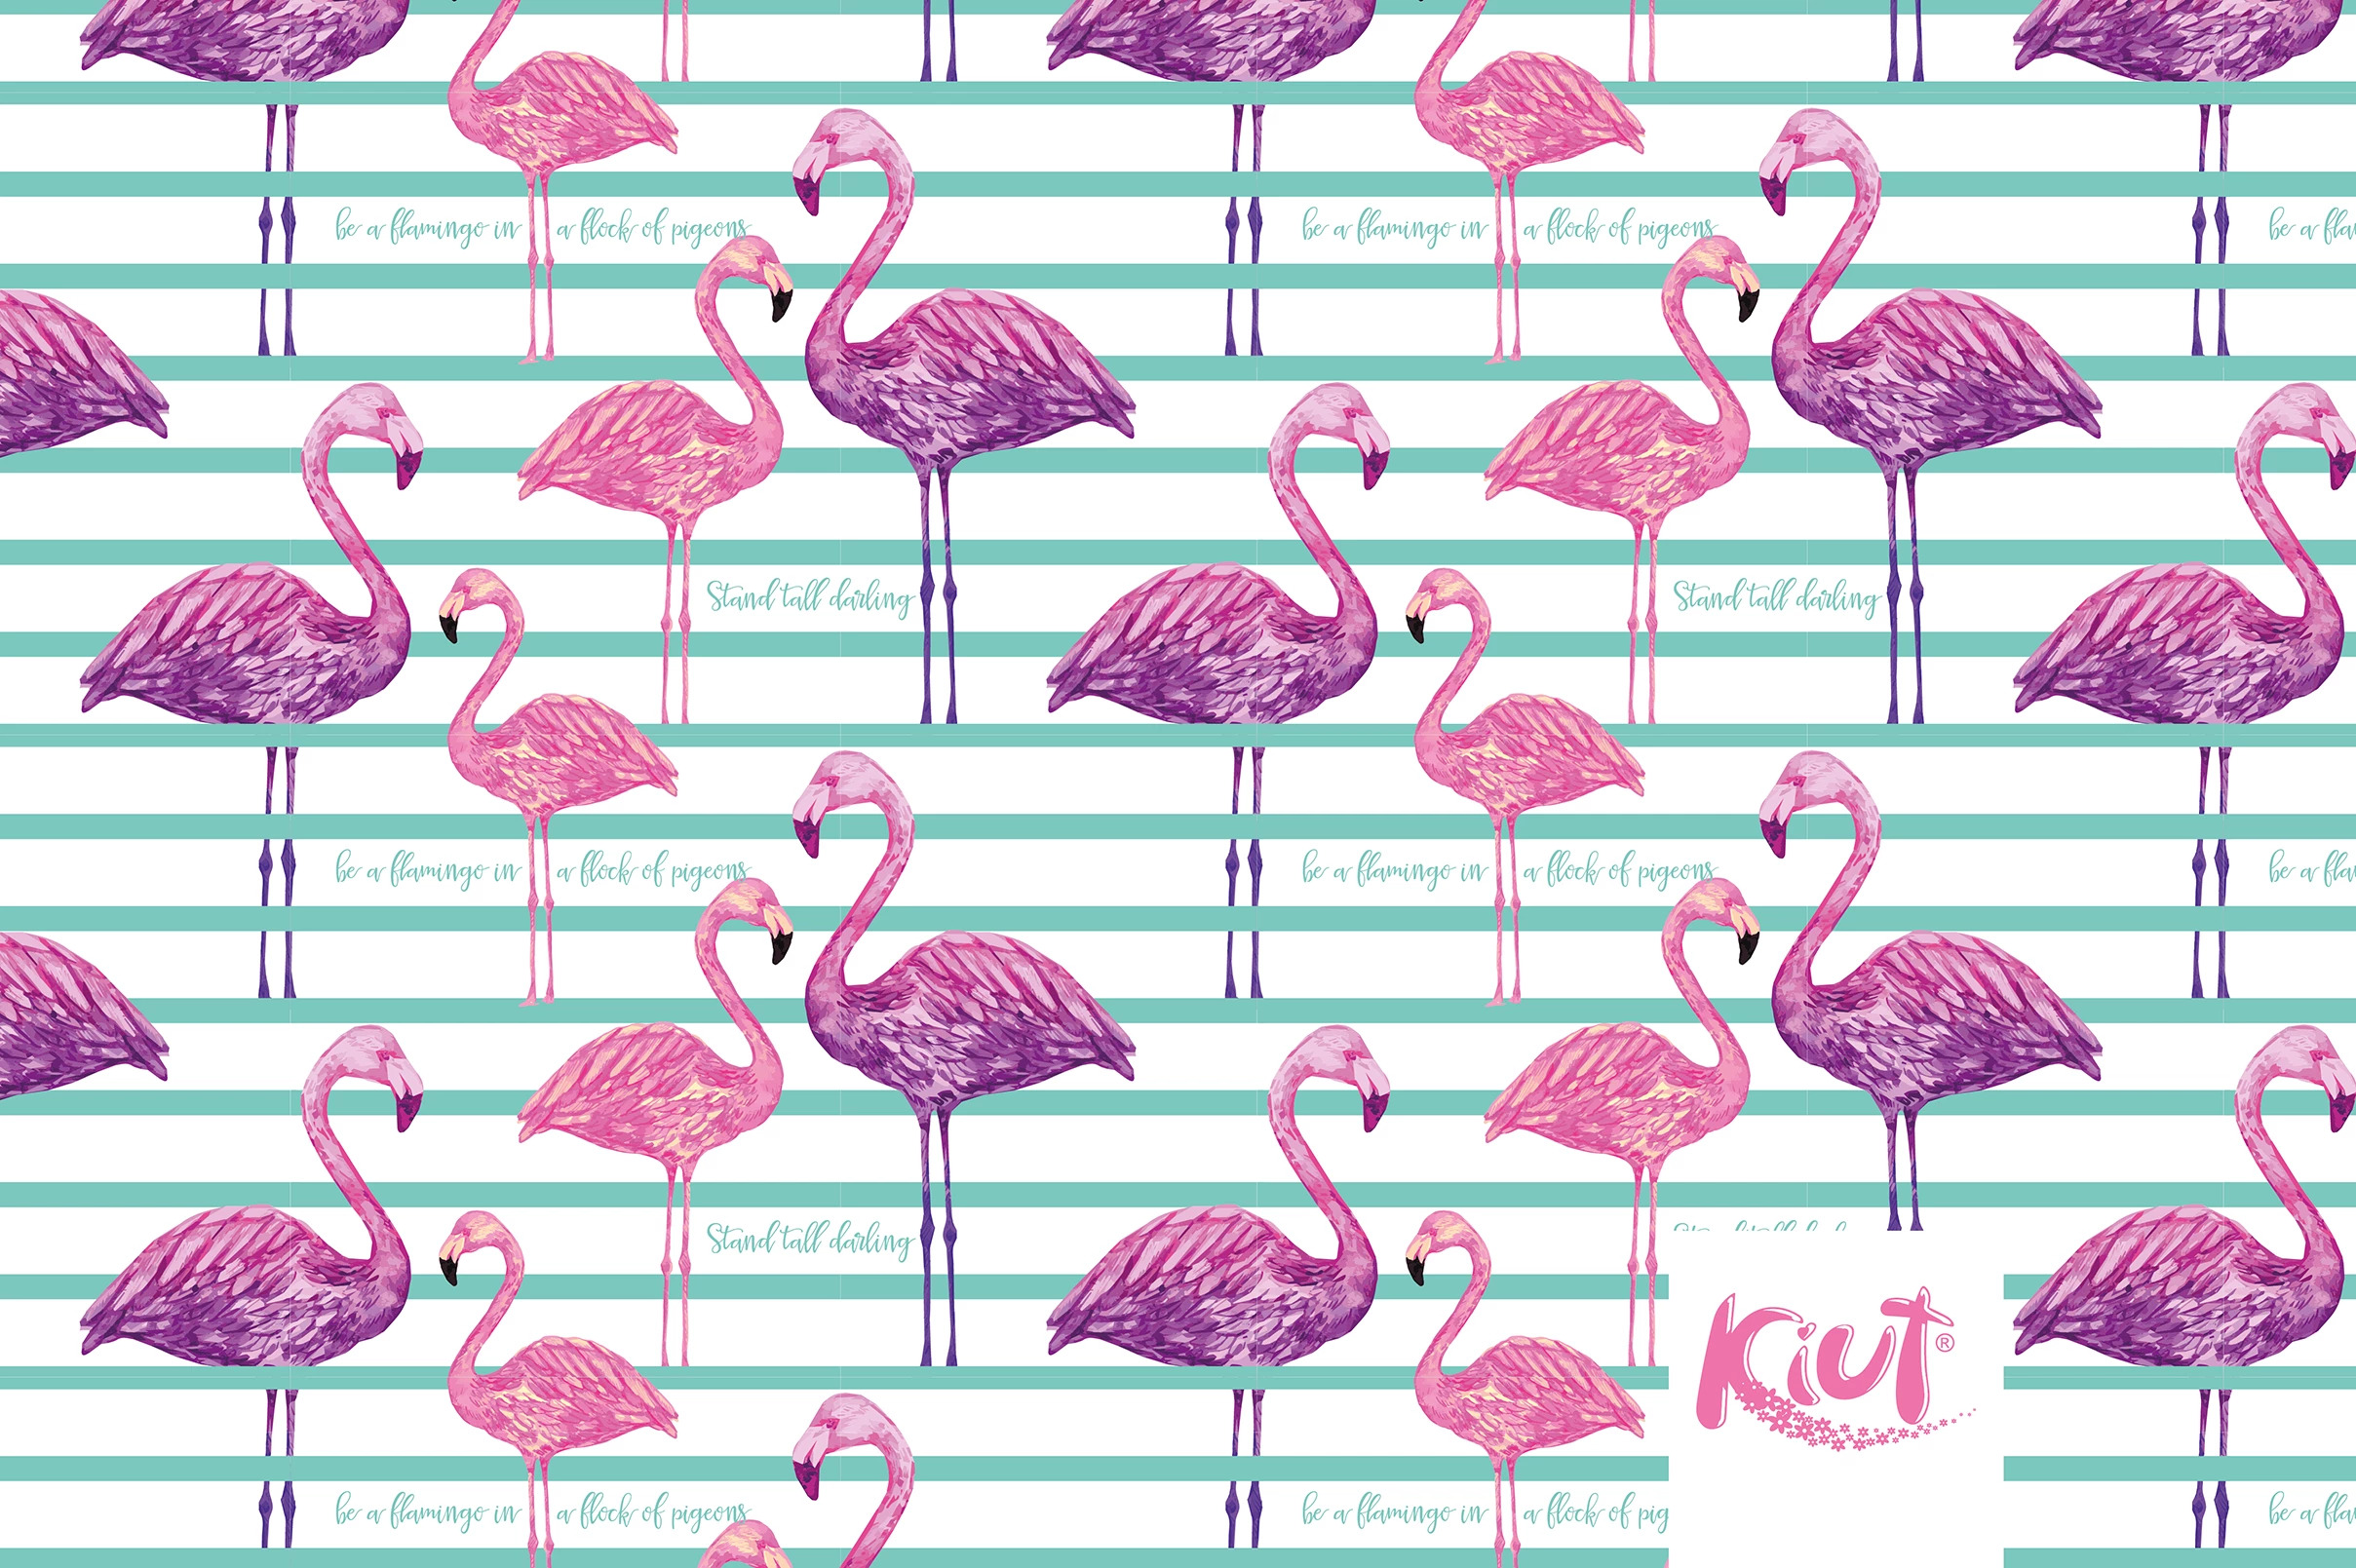 Wallpaper Kiut Flamingo pattern